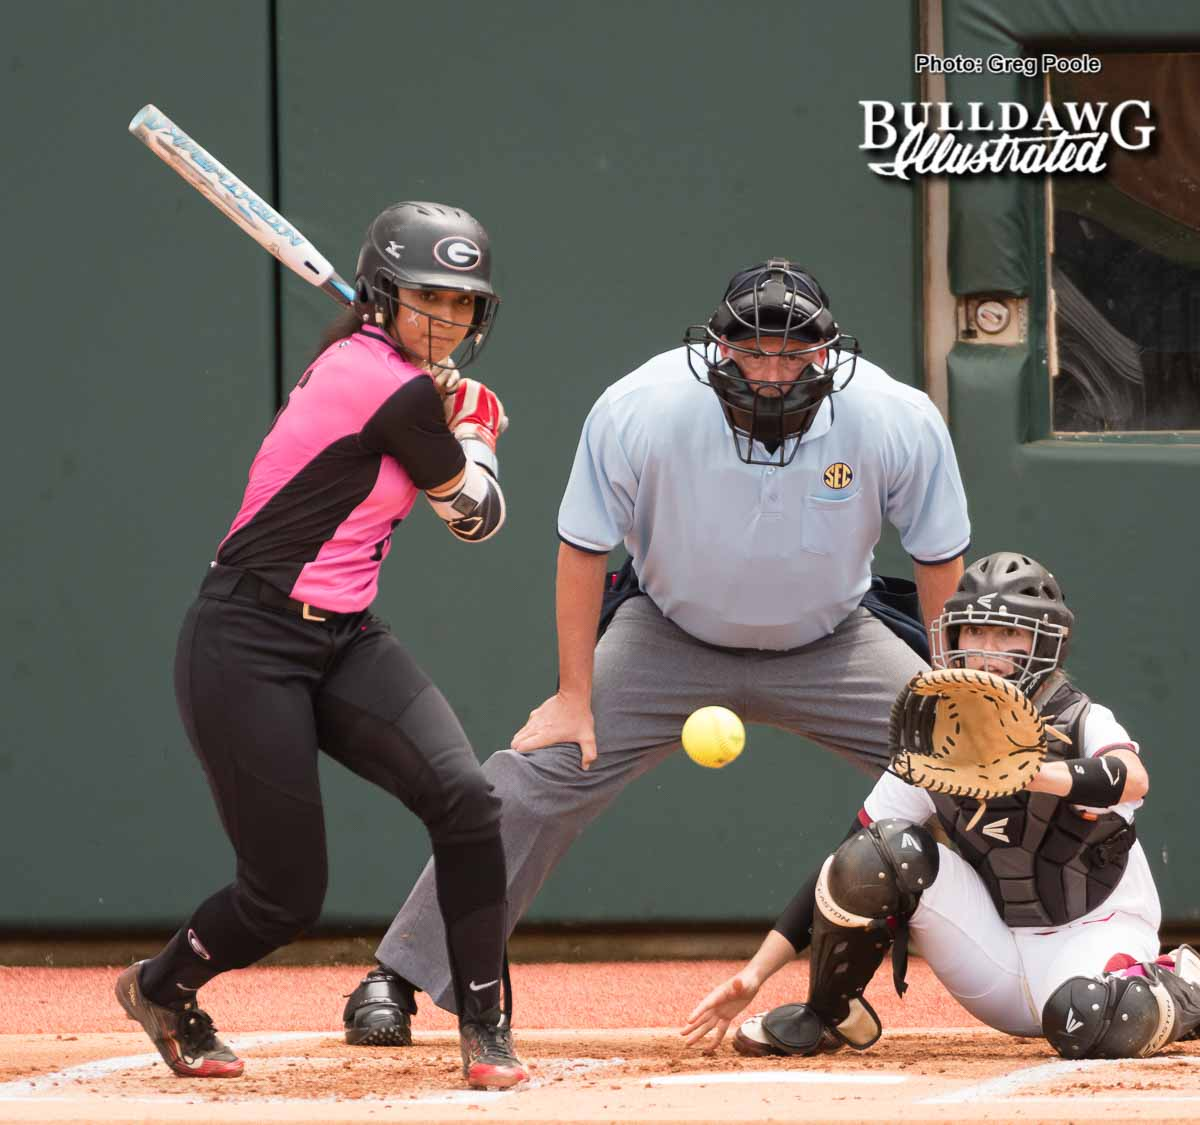 Cortni Emanuel - NFCA All-American outfielder - UGA Women's Softball Team